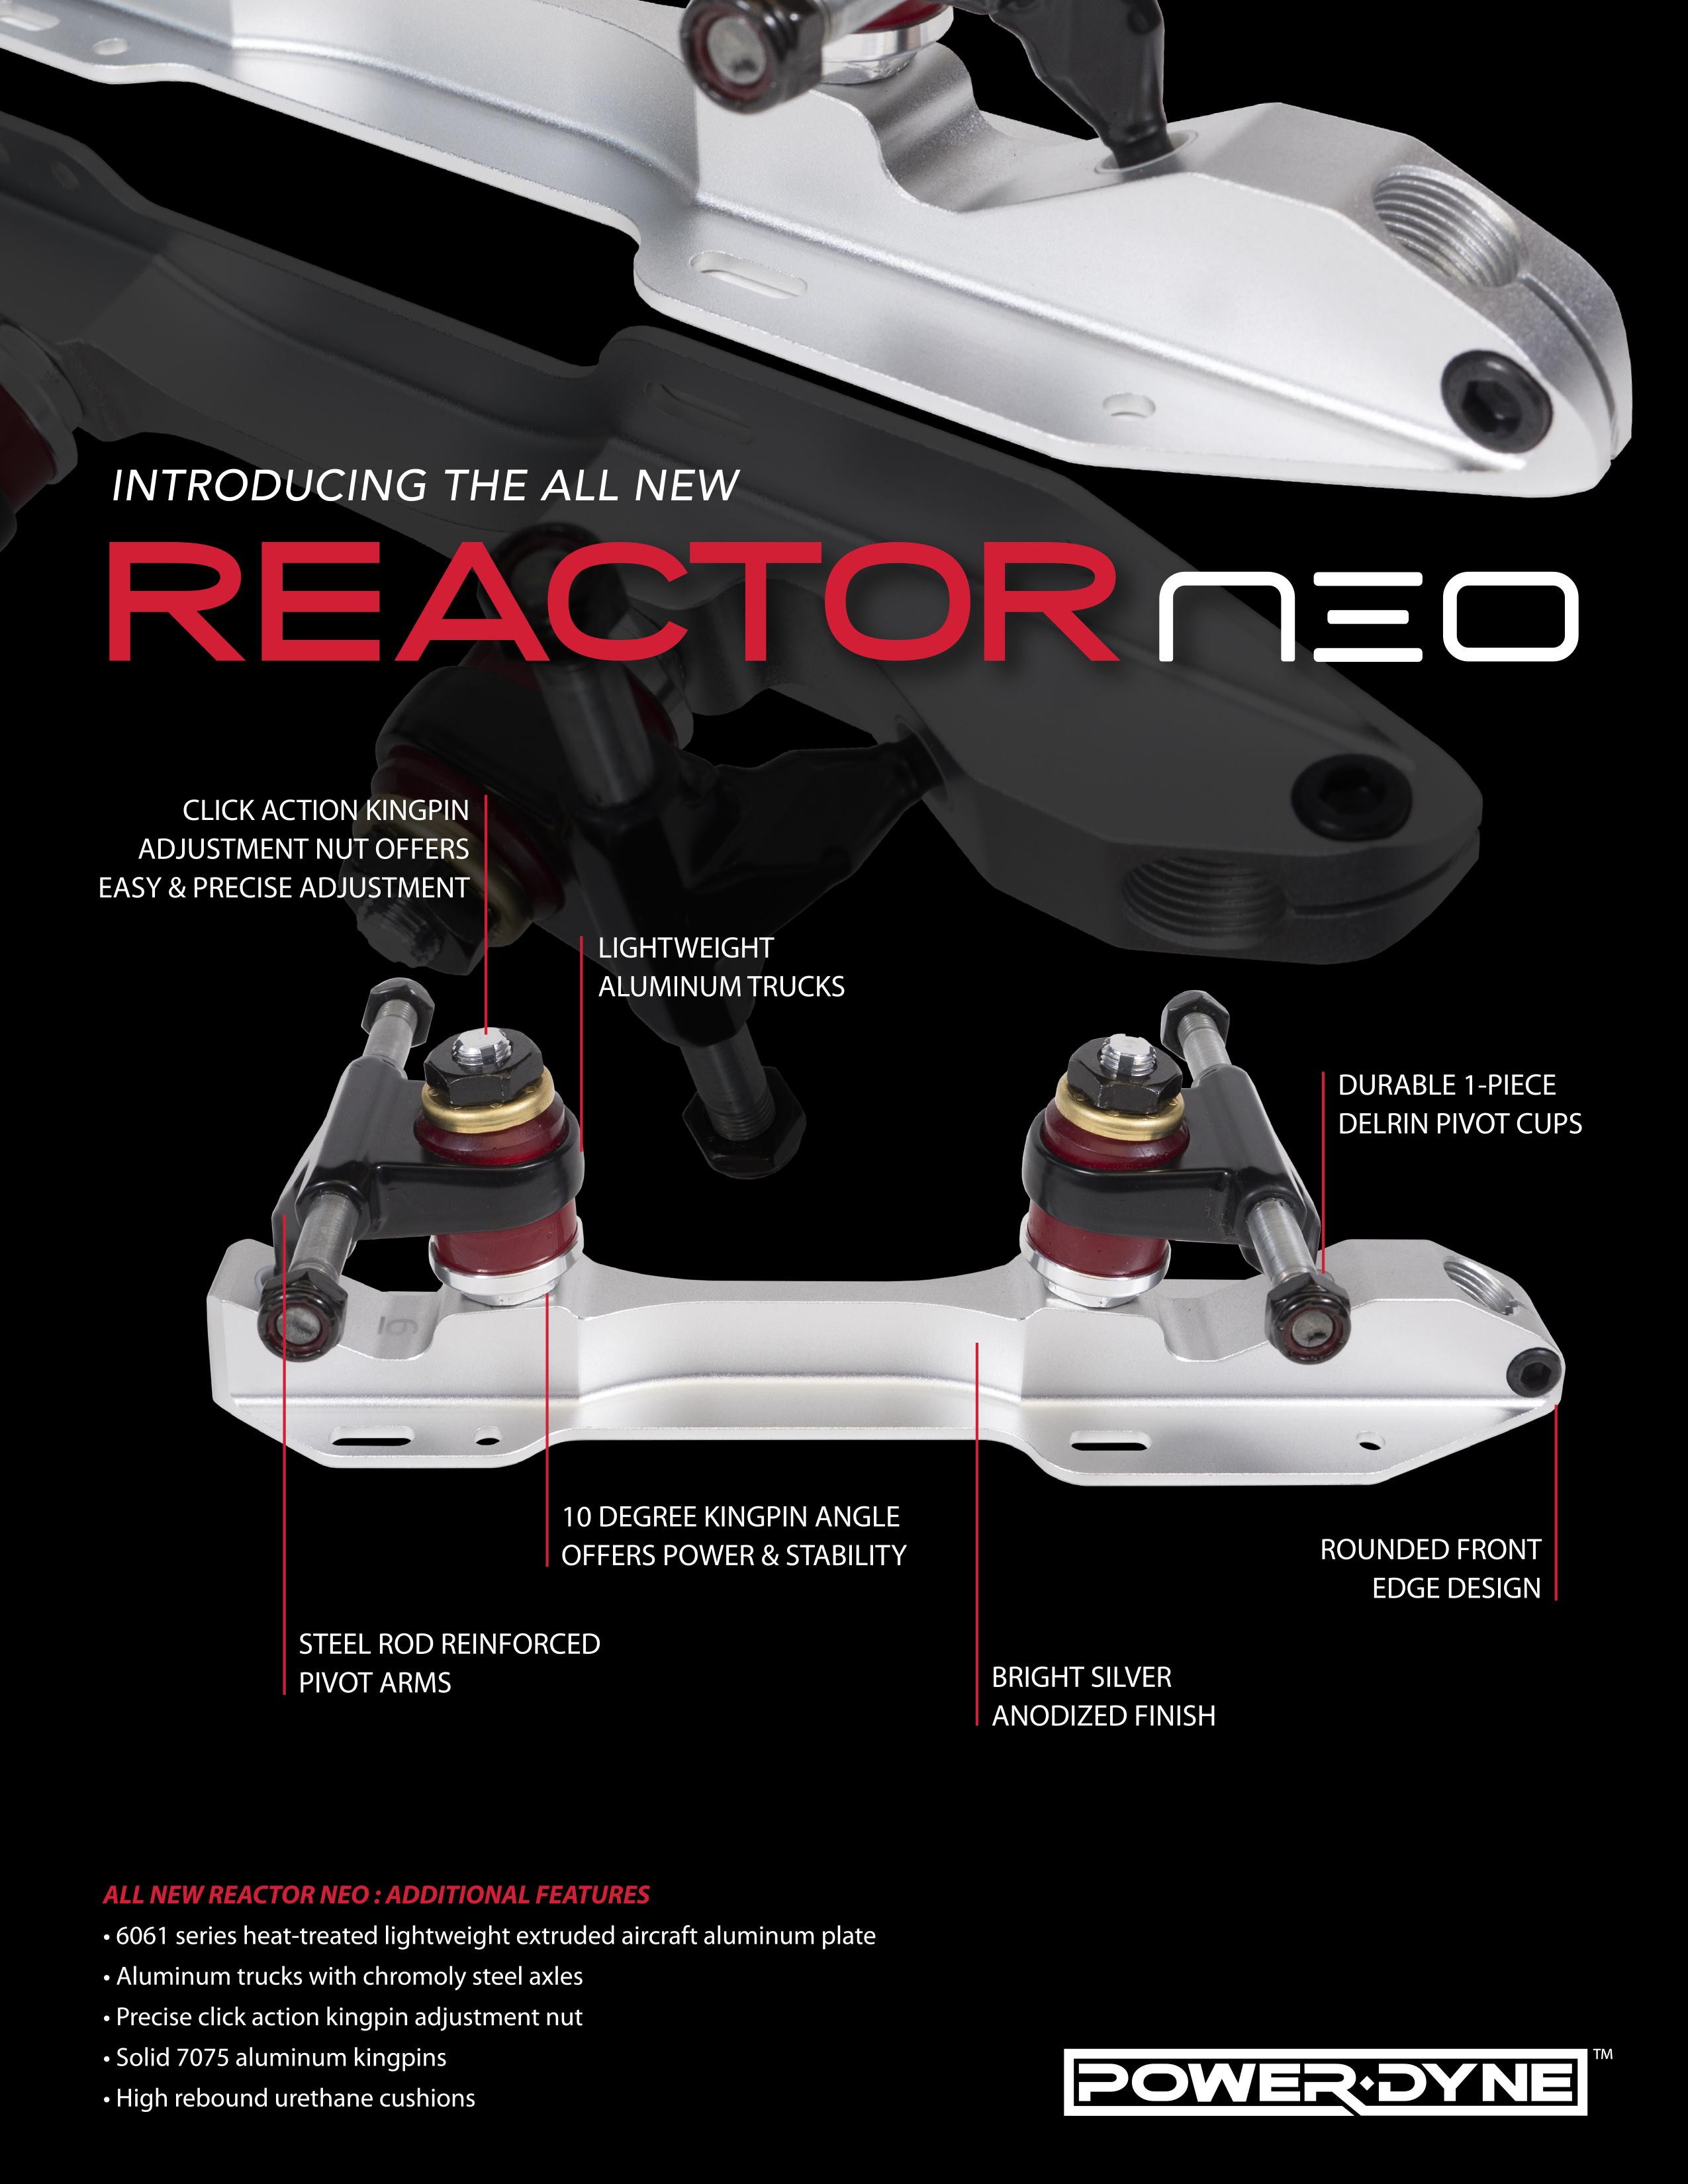 reactor-neo-infographic-fullpage.jpg